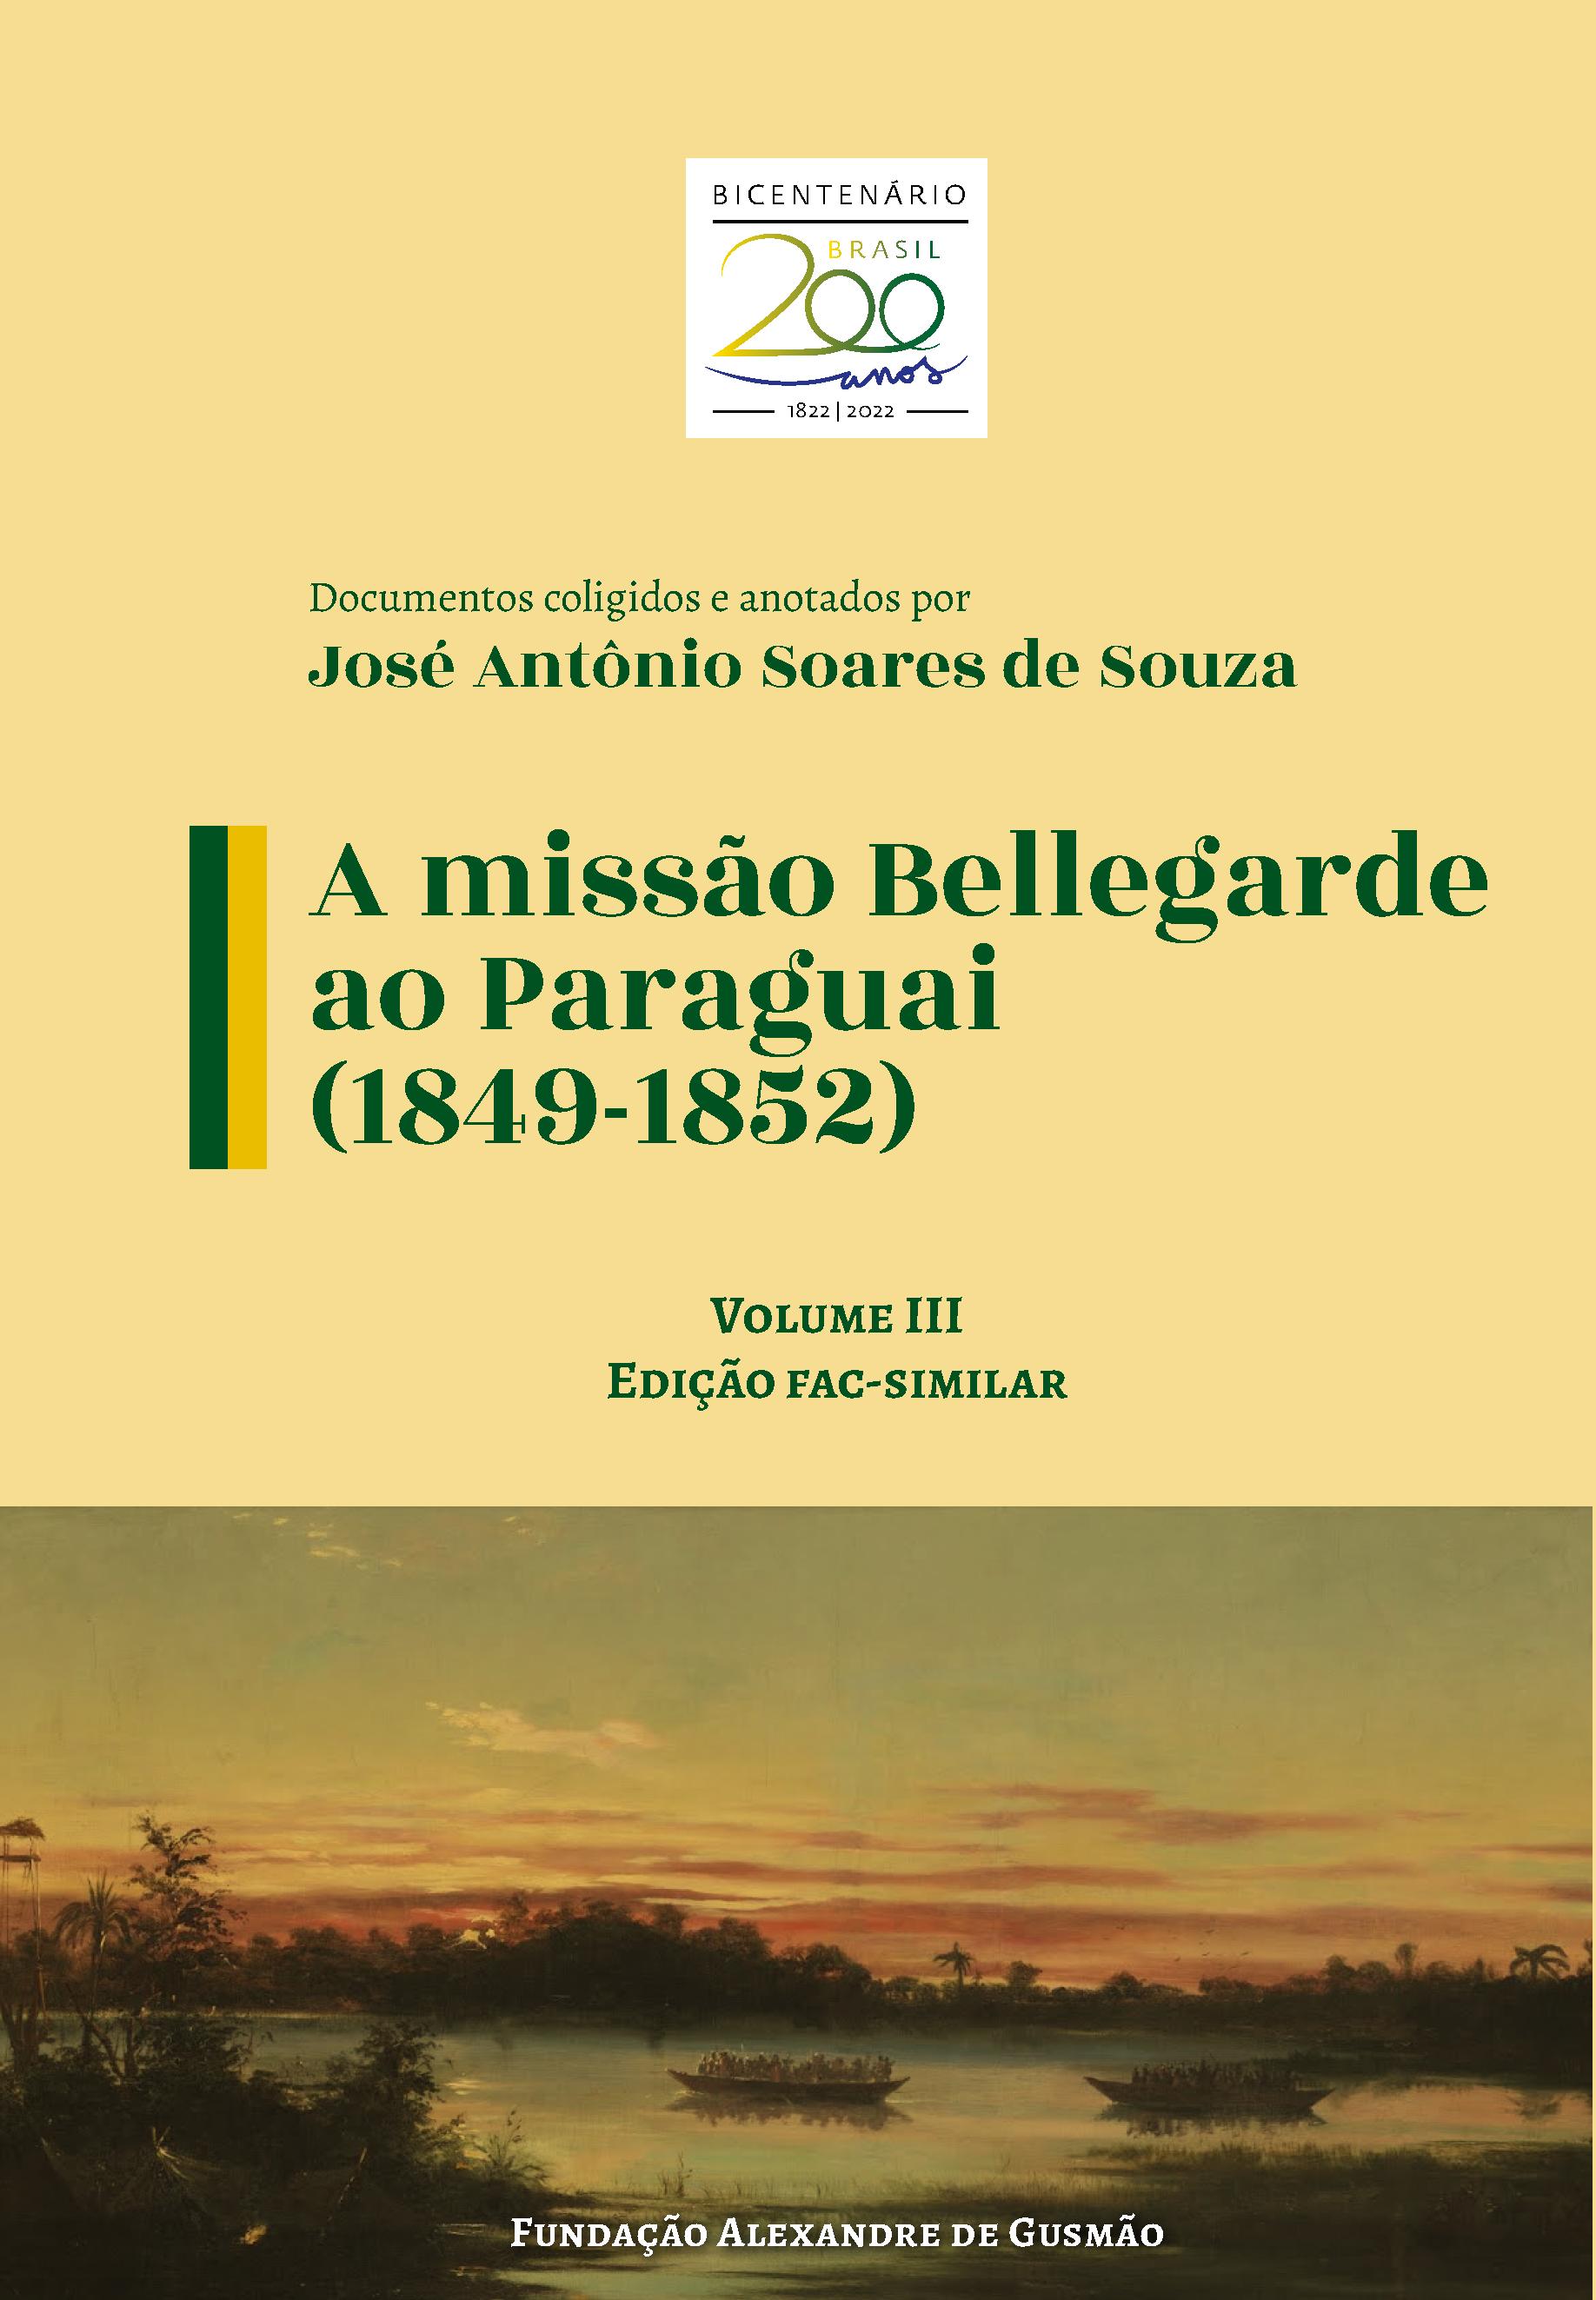 A missão Bellegarde ao Paraguai (1849-1852) - Vol. III Fac-similar